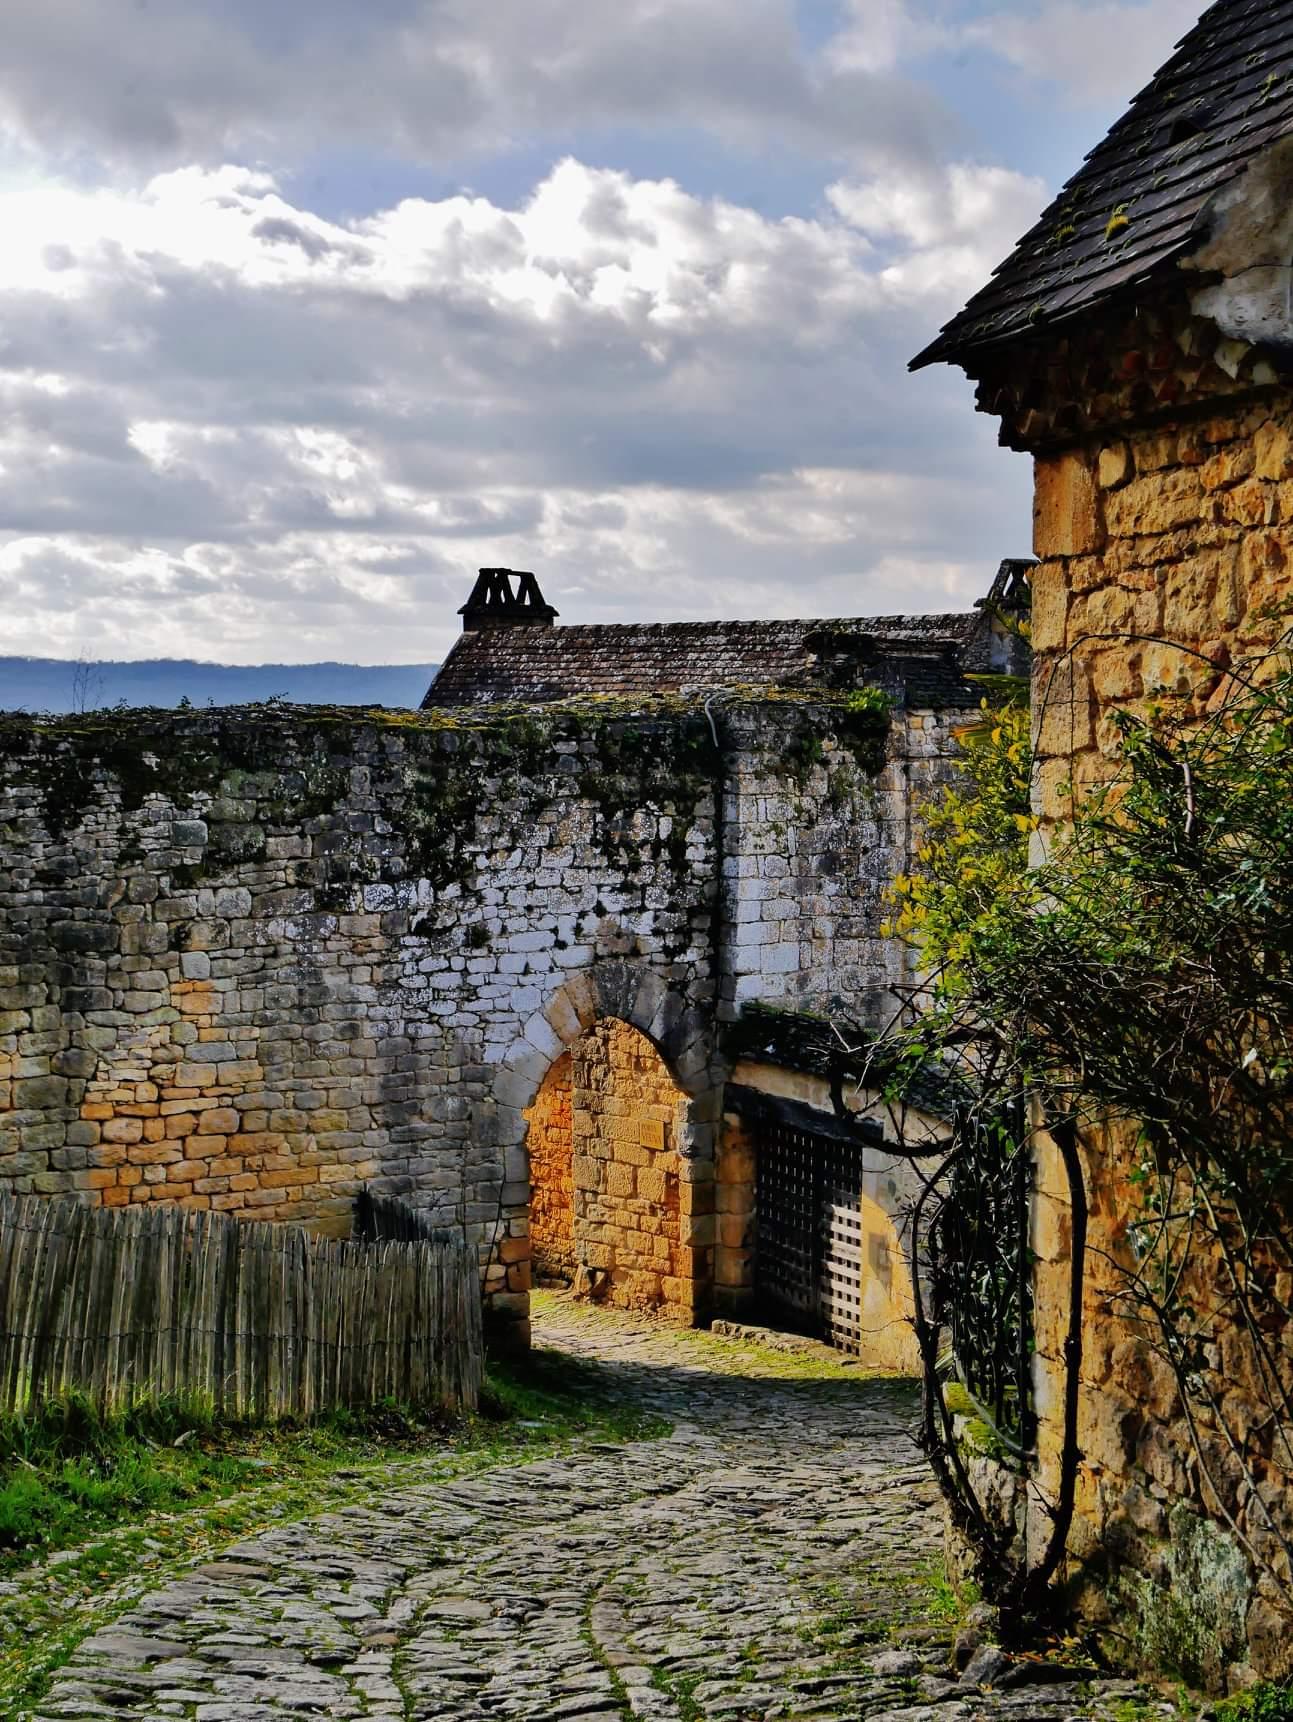 Séjourner proche de Puymartin